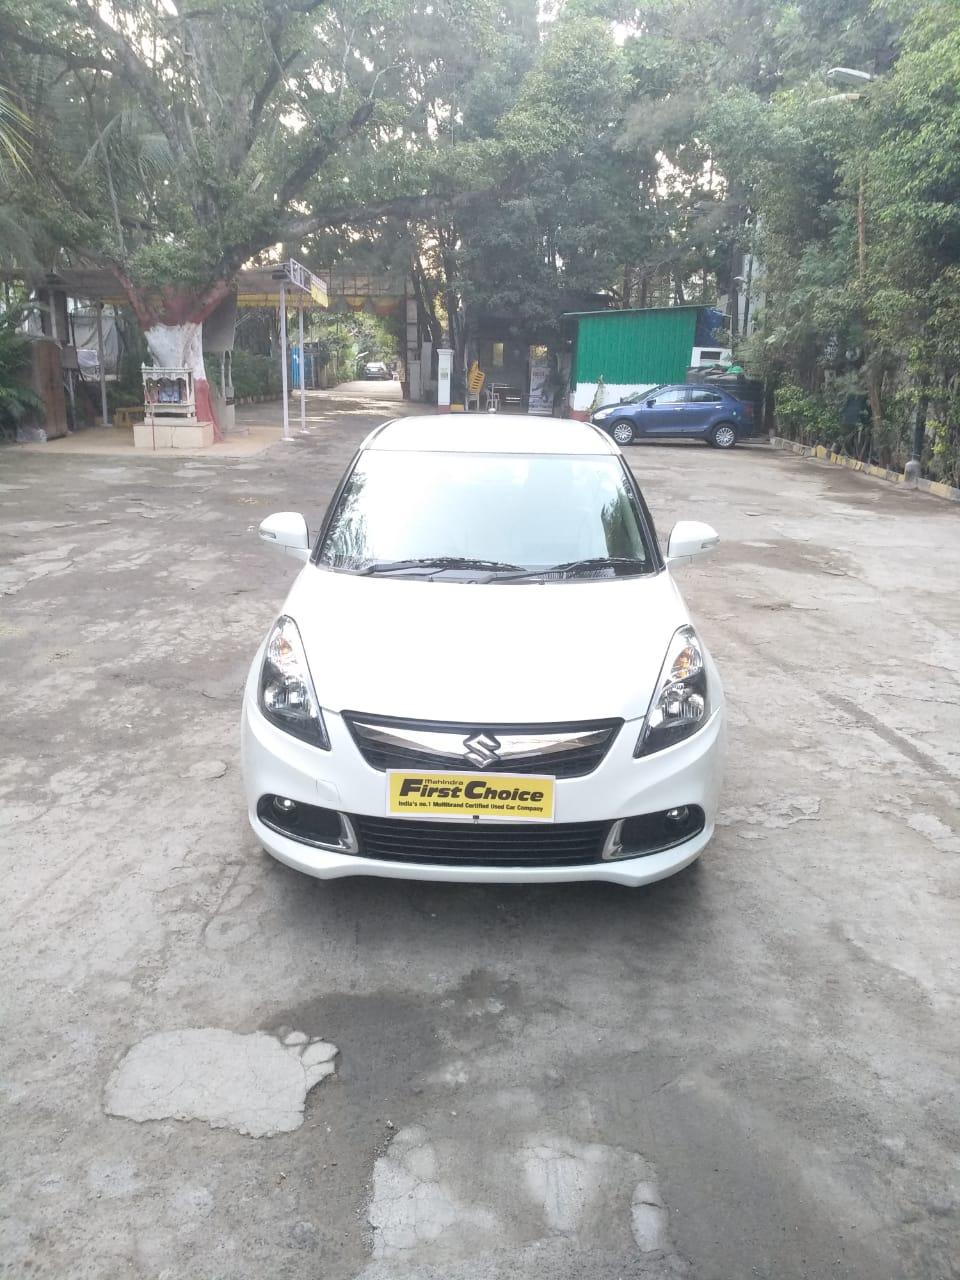 Used Maruti Suzuki In Pune Mahindra First Choice